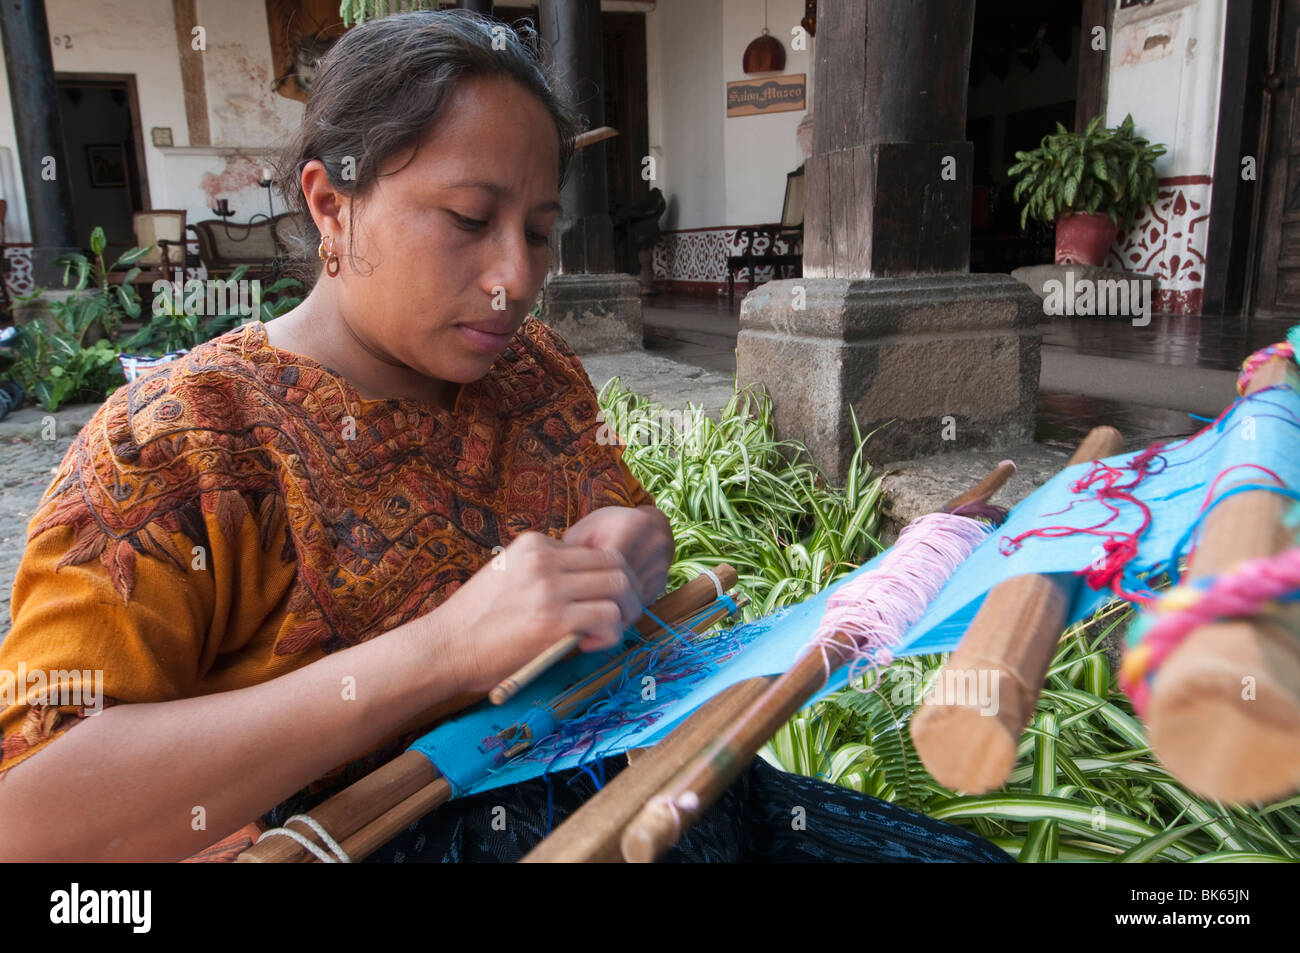 Woman weaving cloth, Antigua, Guatemala, Central America - Stock Image